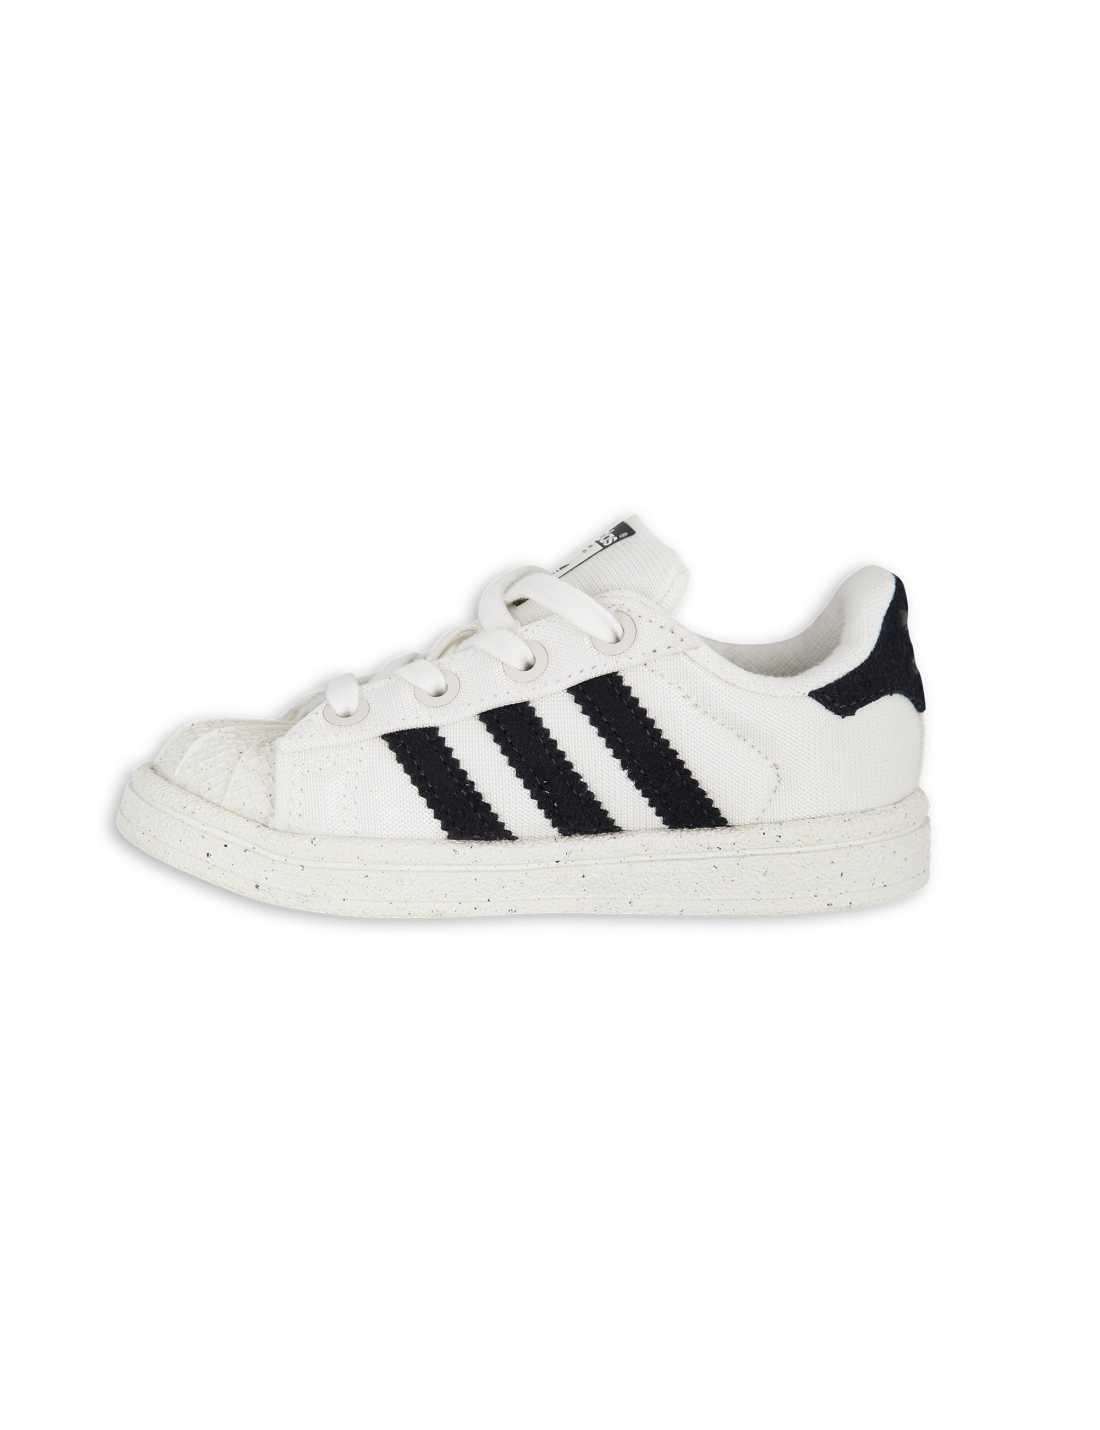 Adidas Originals By Mini Rodini Superstar Shoes